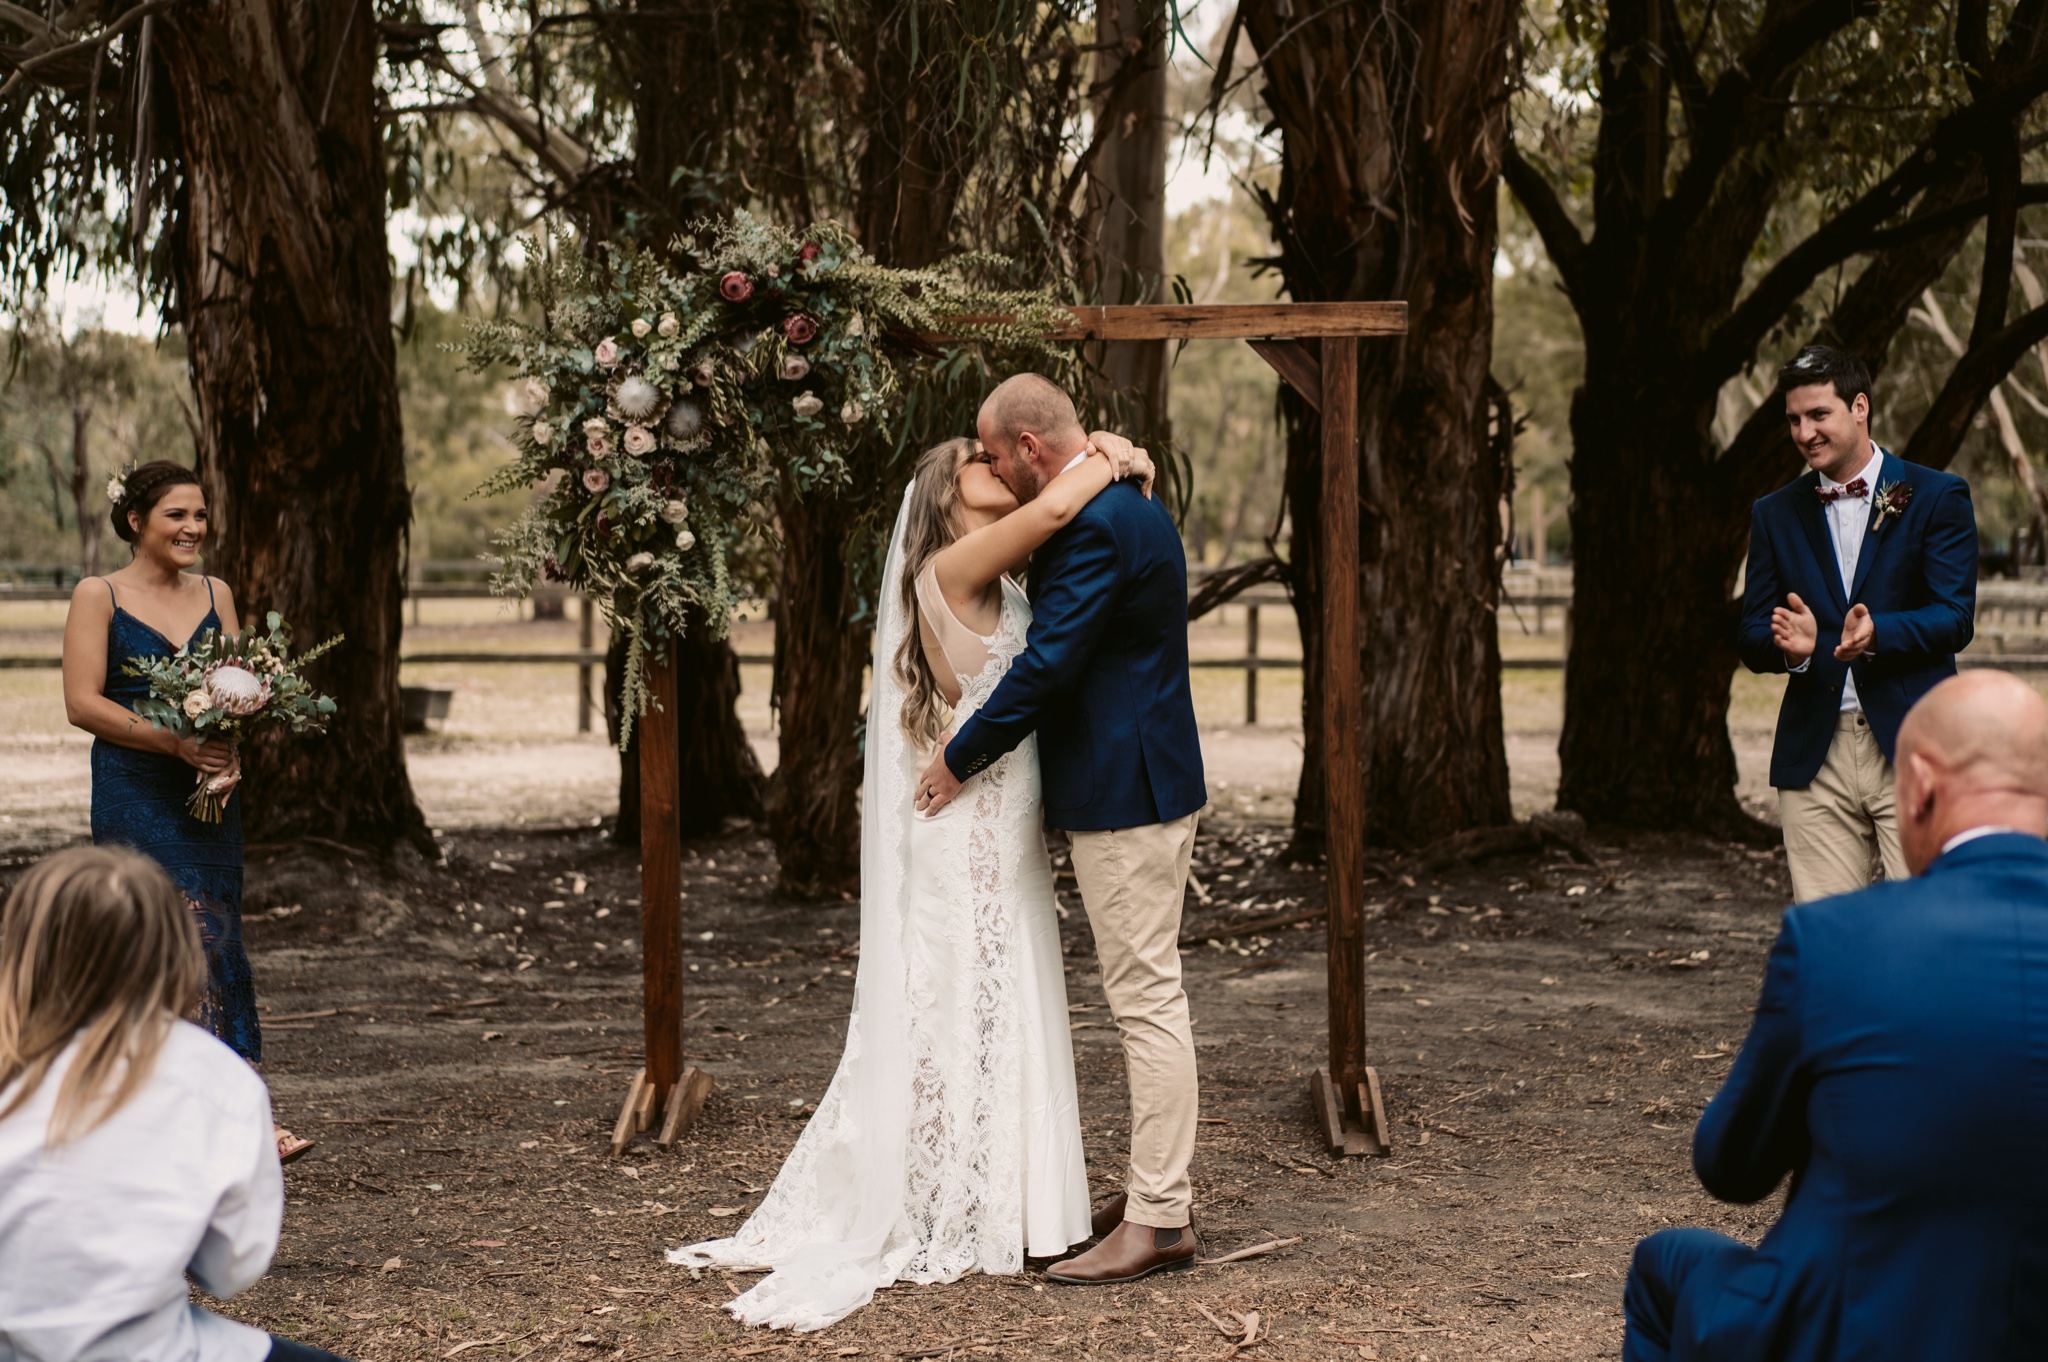 Mornington Peninsula Wedding Photography55.jpg